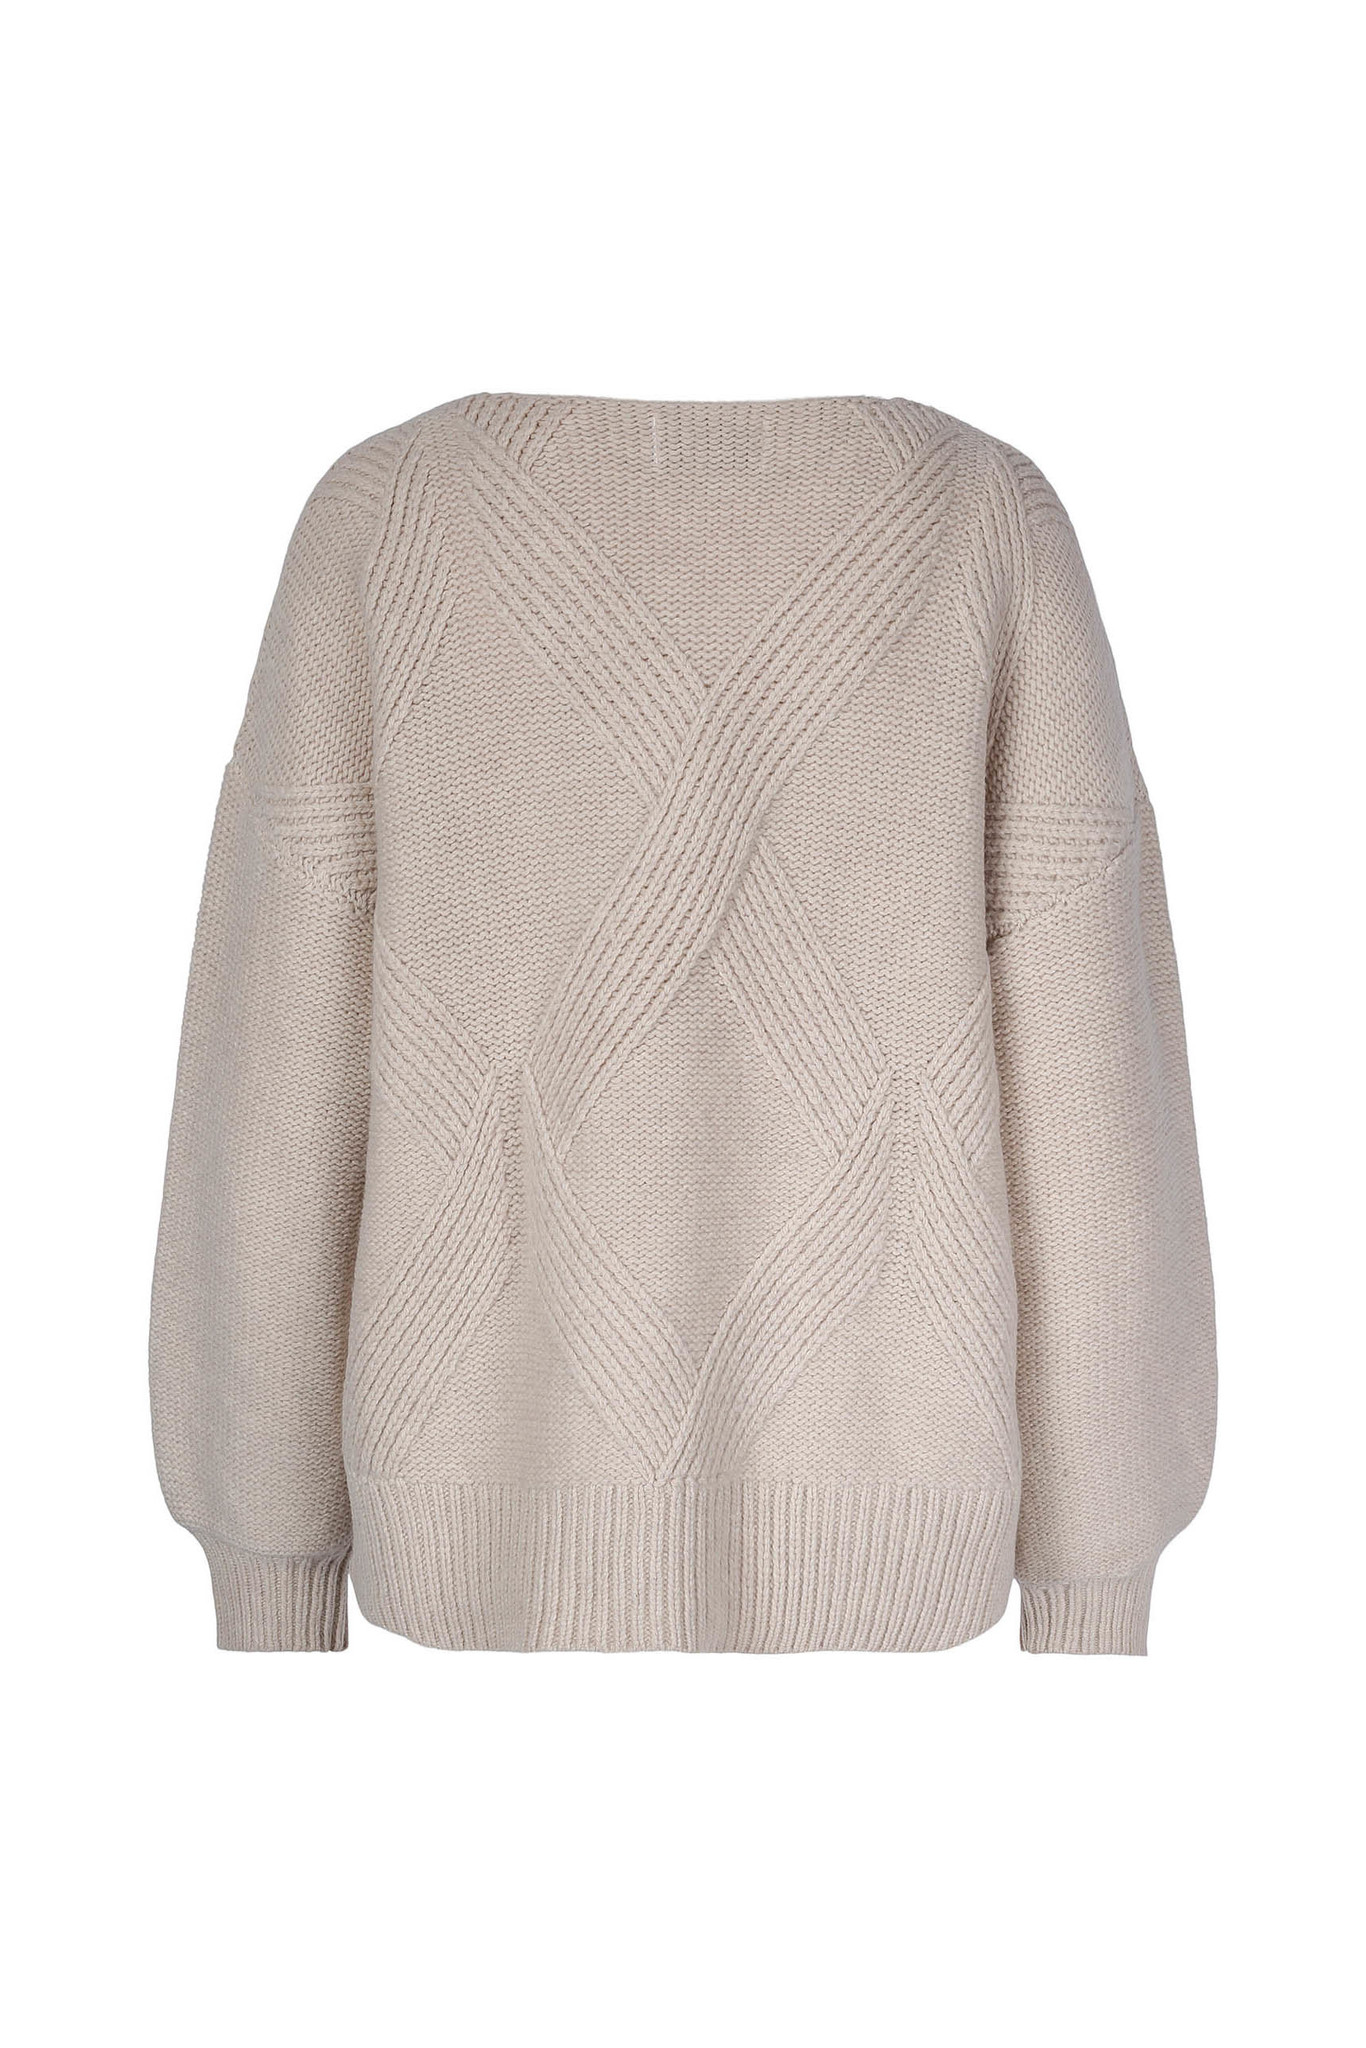 Hermine Sweater - Antique White-2